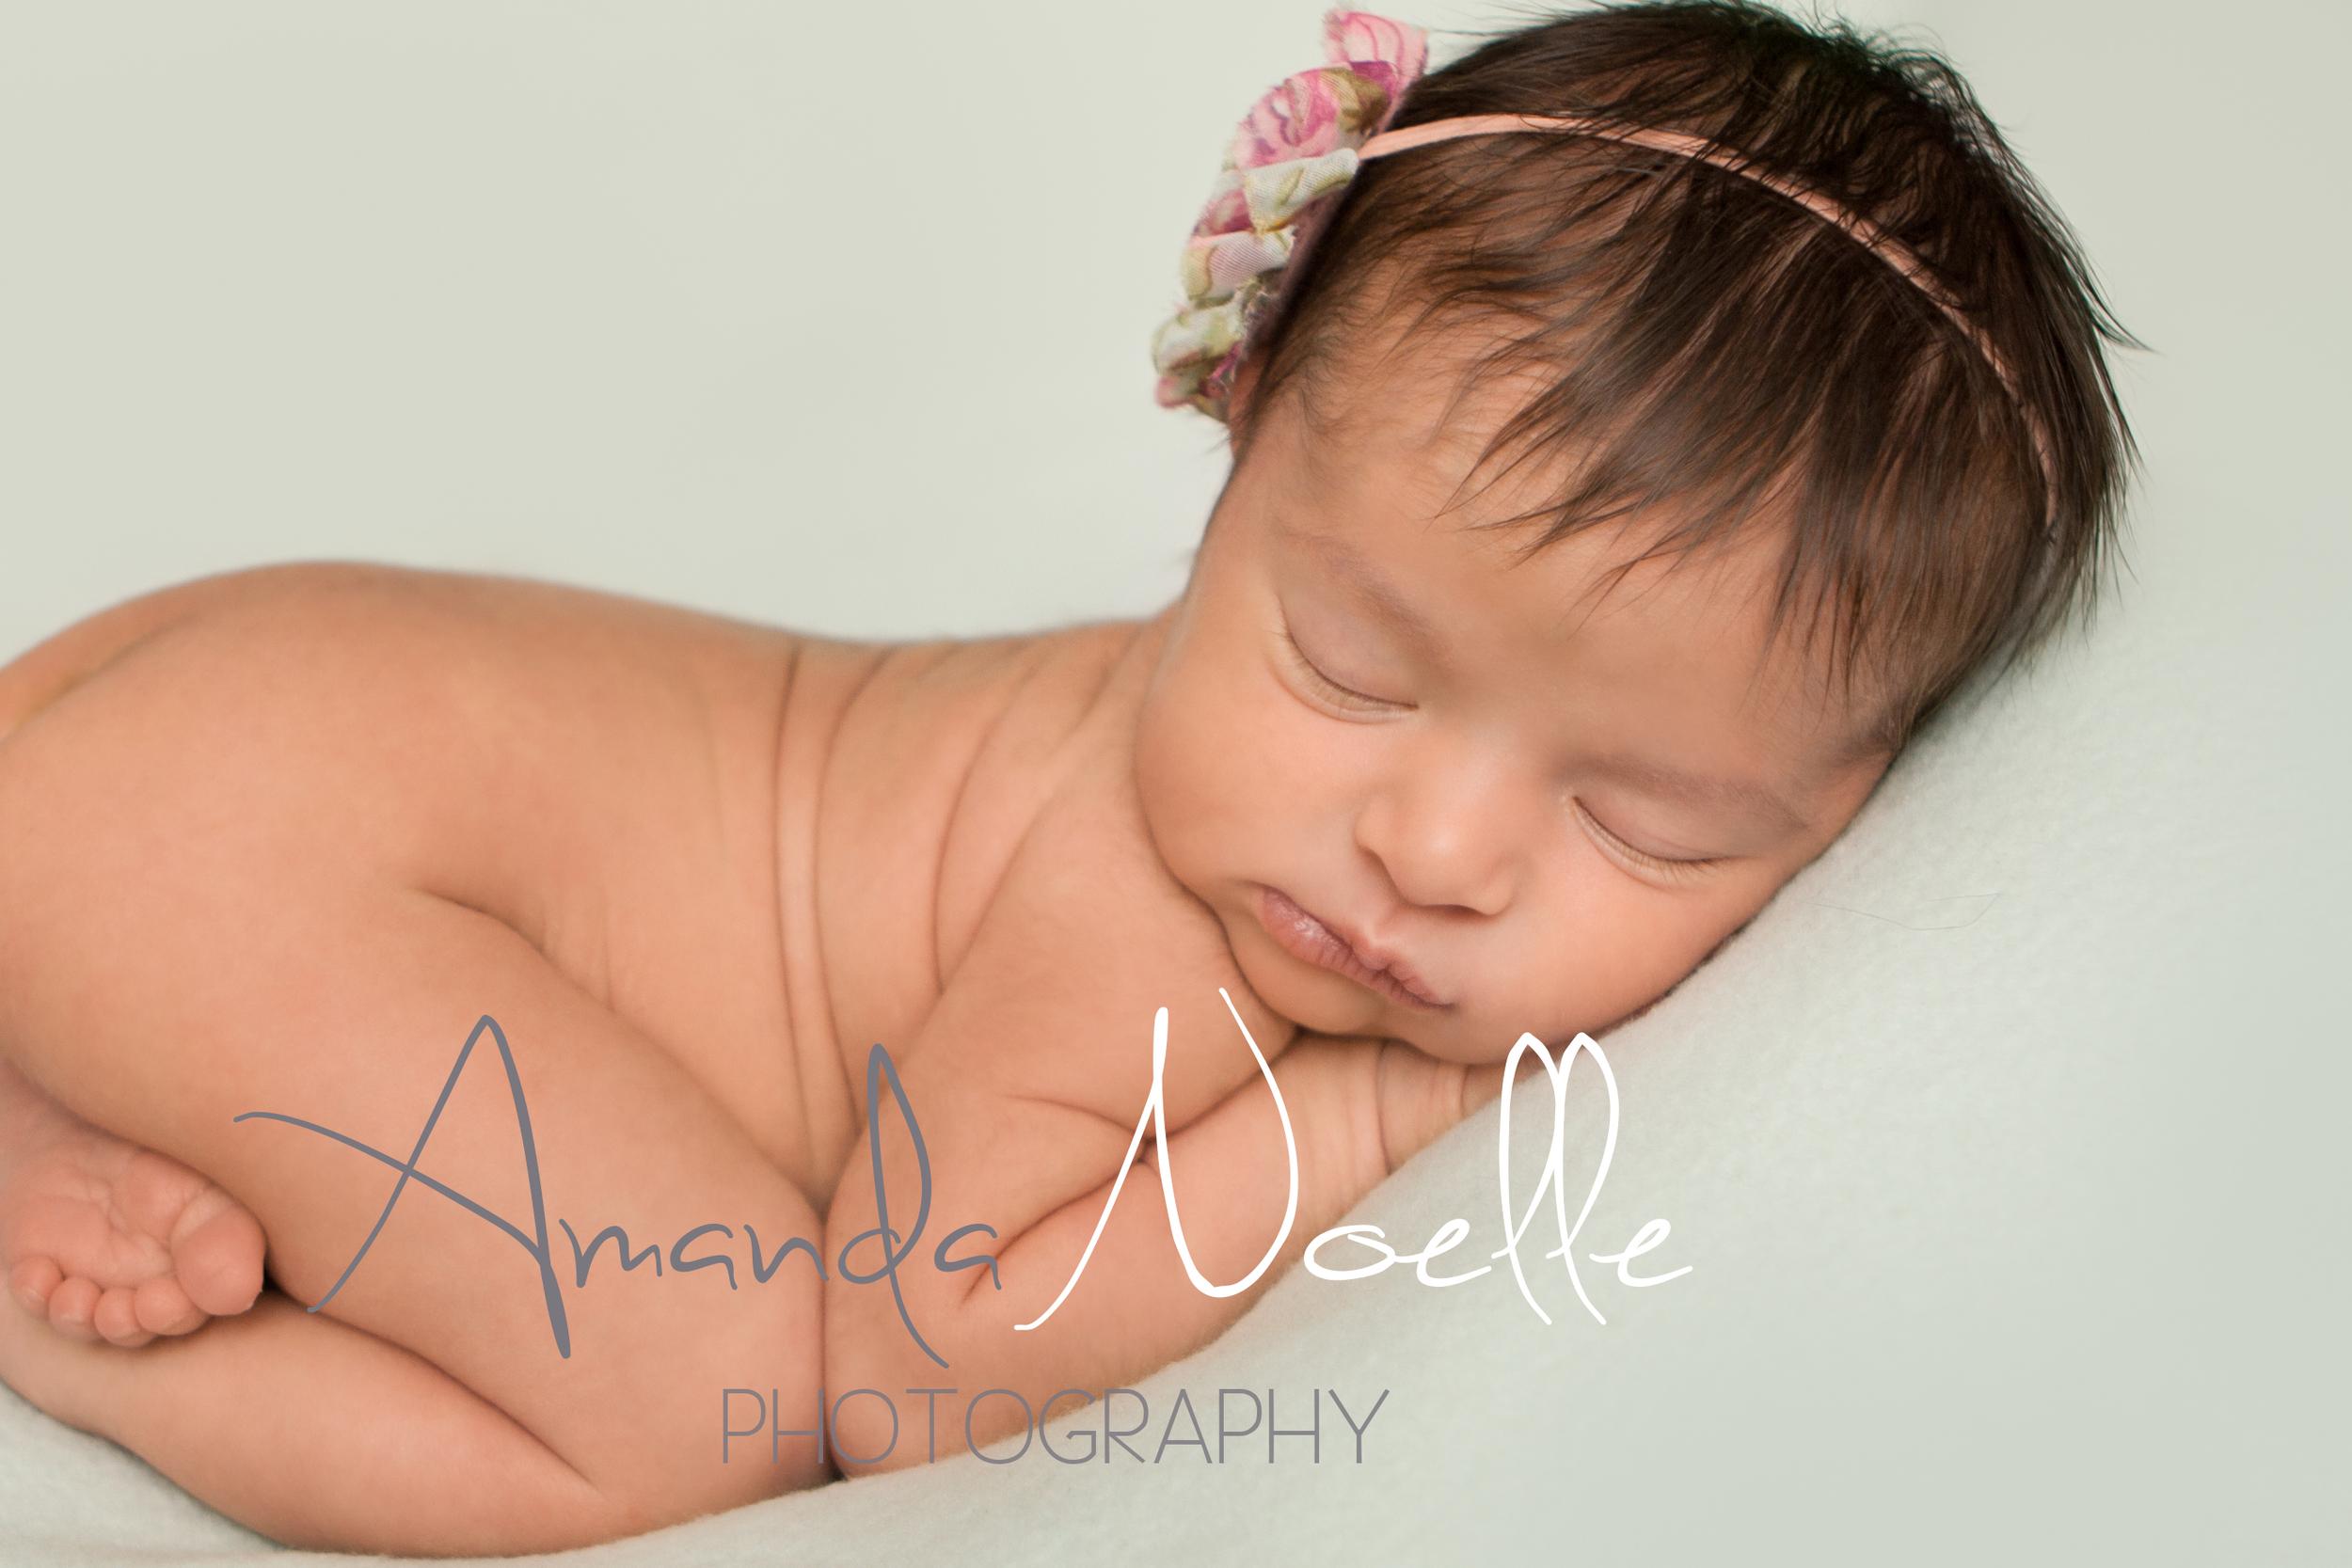 Newborn baby girl sleepingwith shabby chic pink  headband on teal mint aqua fabric backdrop, tushy upbeanbag pose, Westchester, County New York Newborn Photographer, Amanda Noelle Photography.